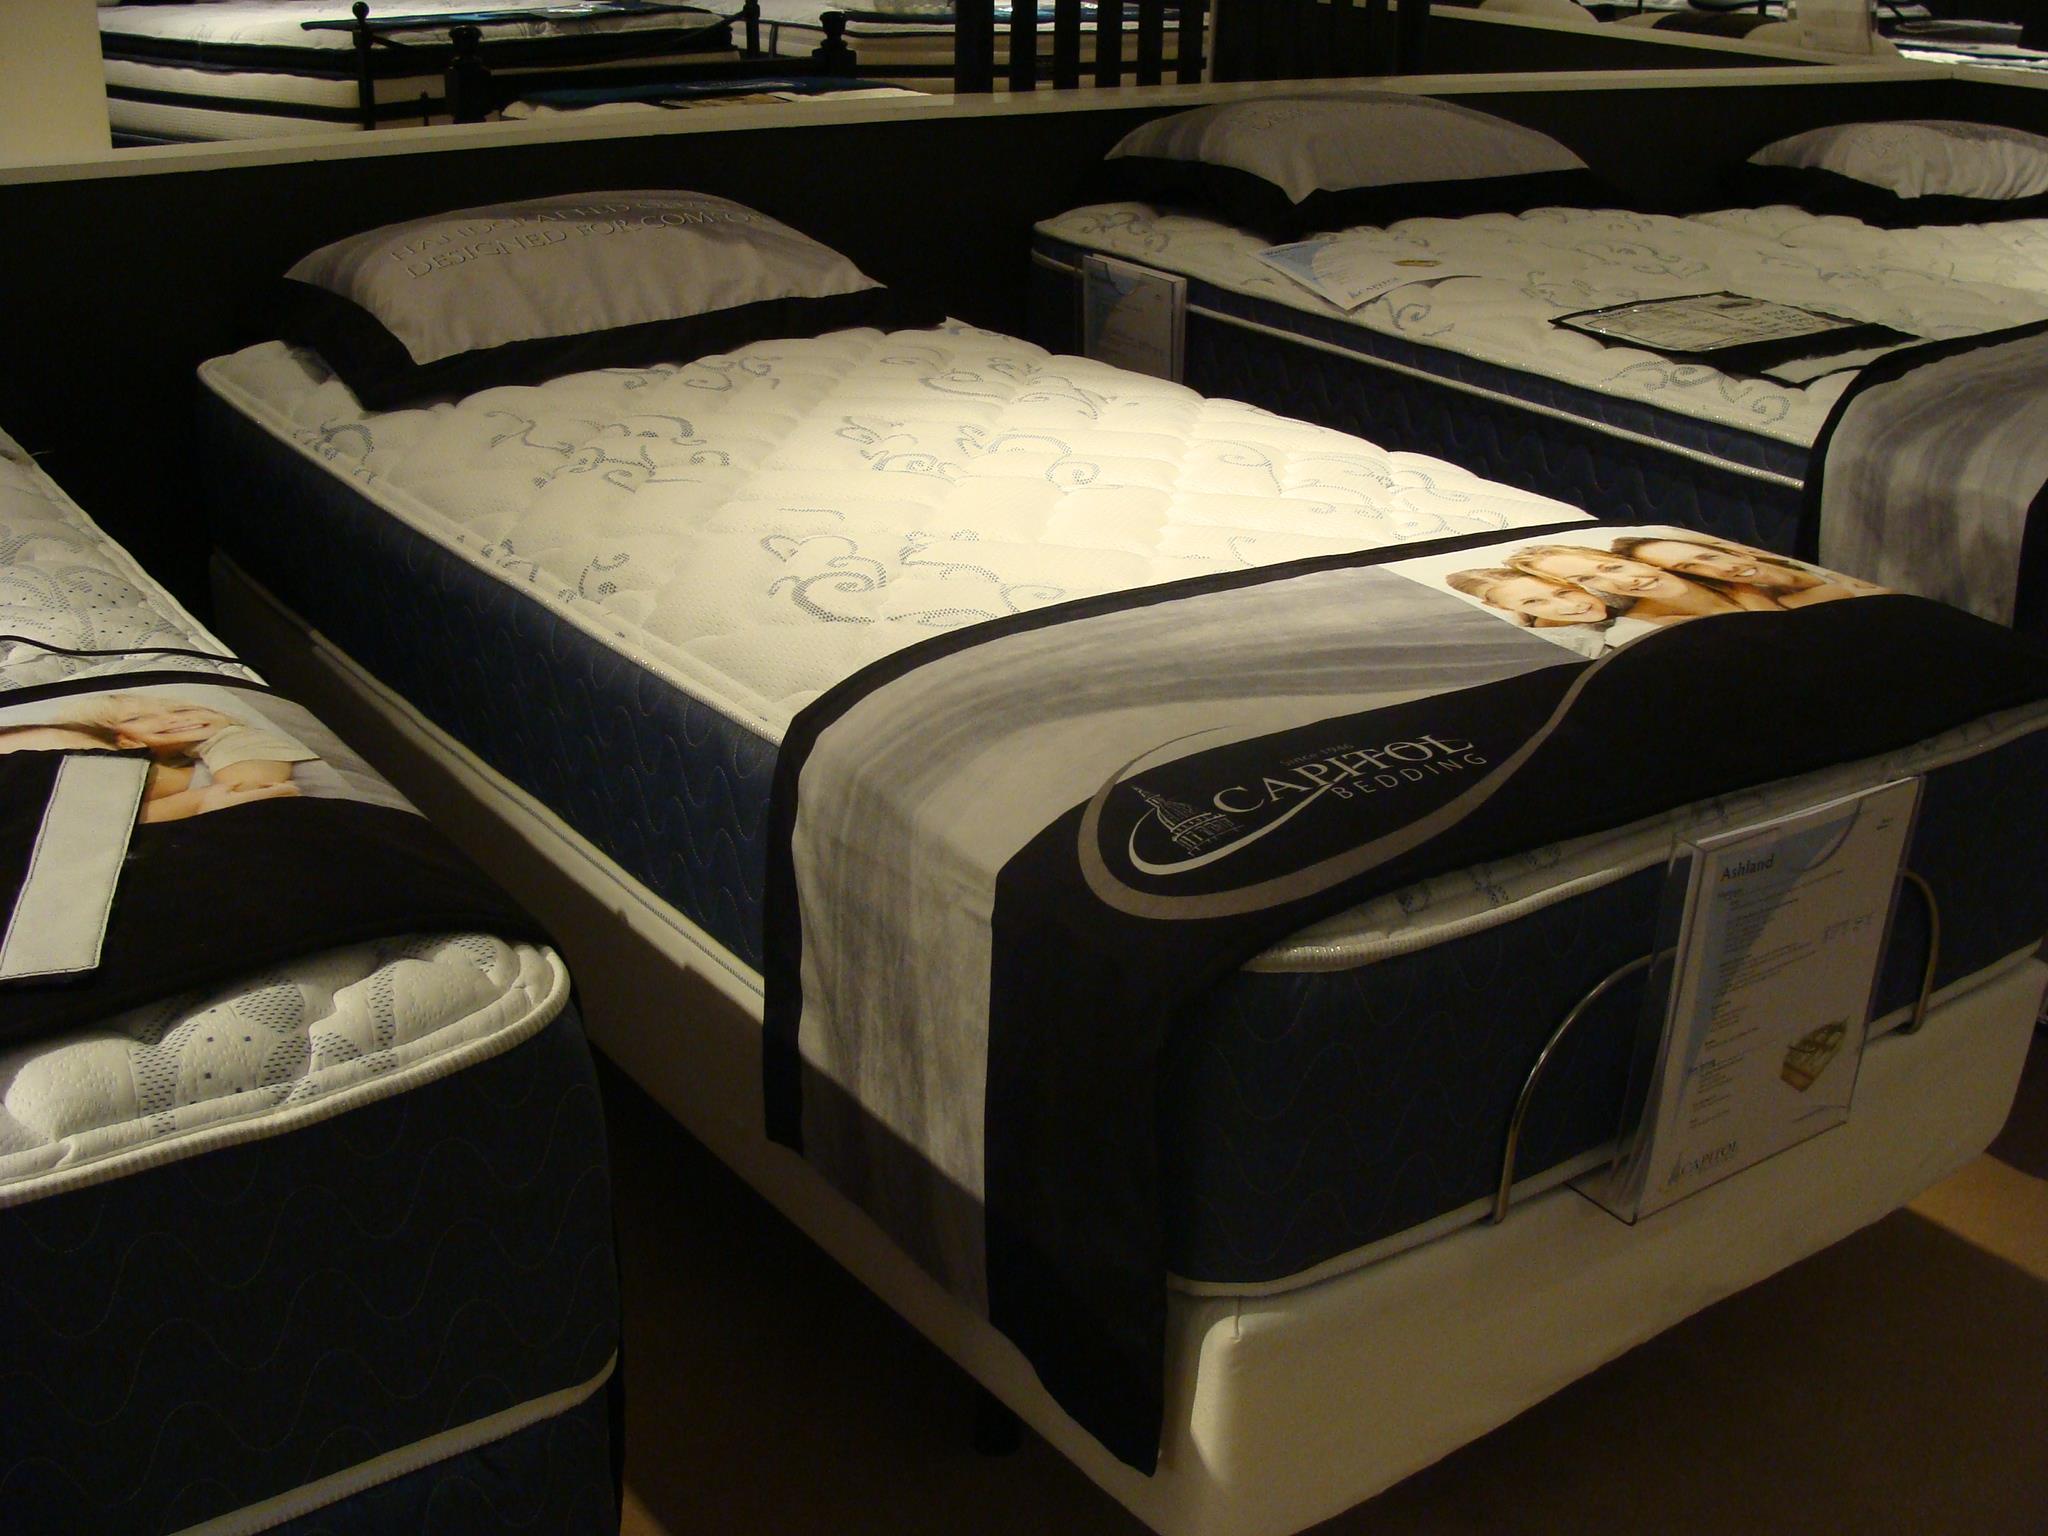 Capitol Bedding Ashland King Mattress Only - Item Number: VertiCoil-K